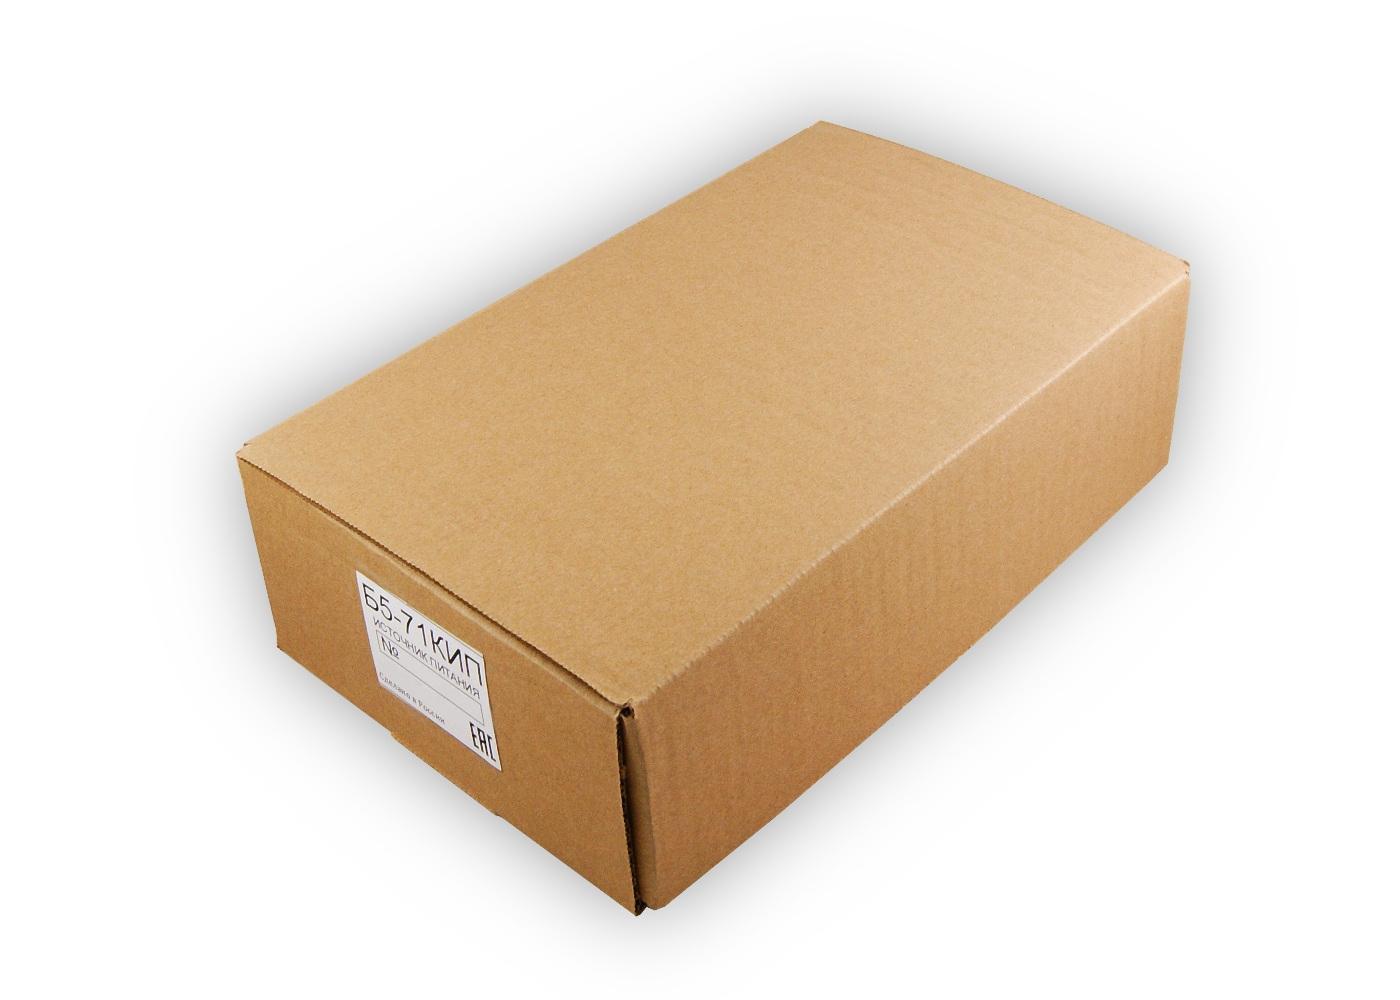 Упаковка для Б5-71КИП